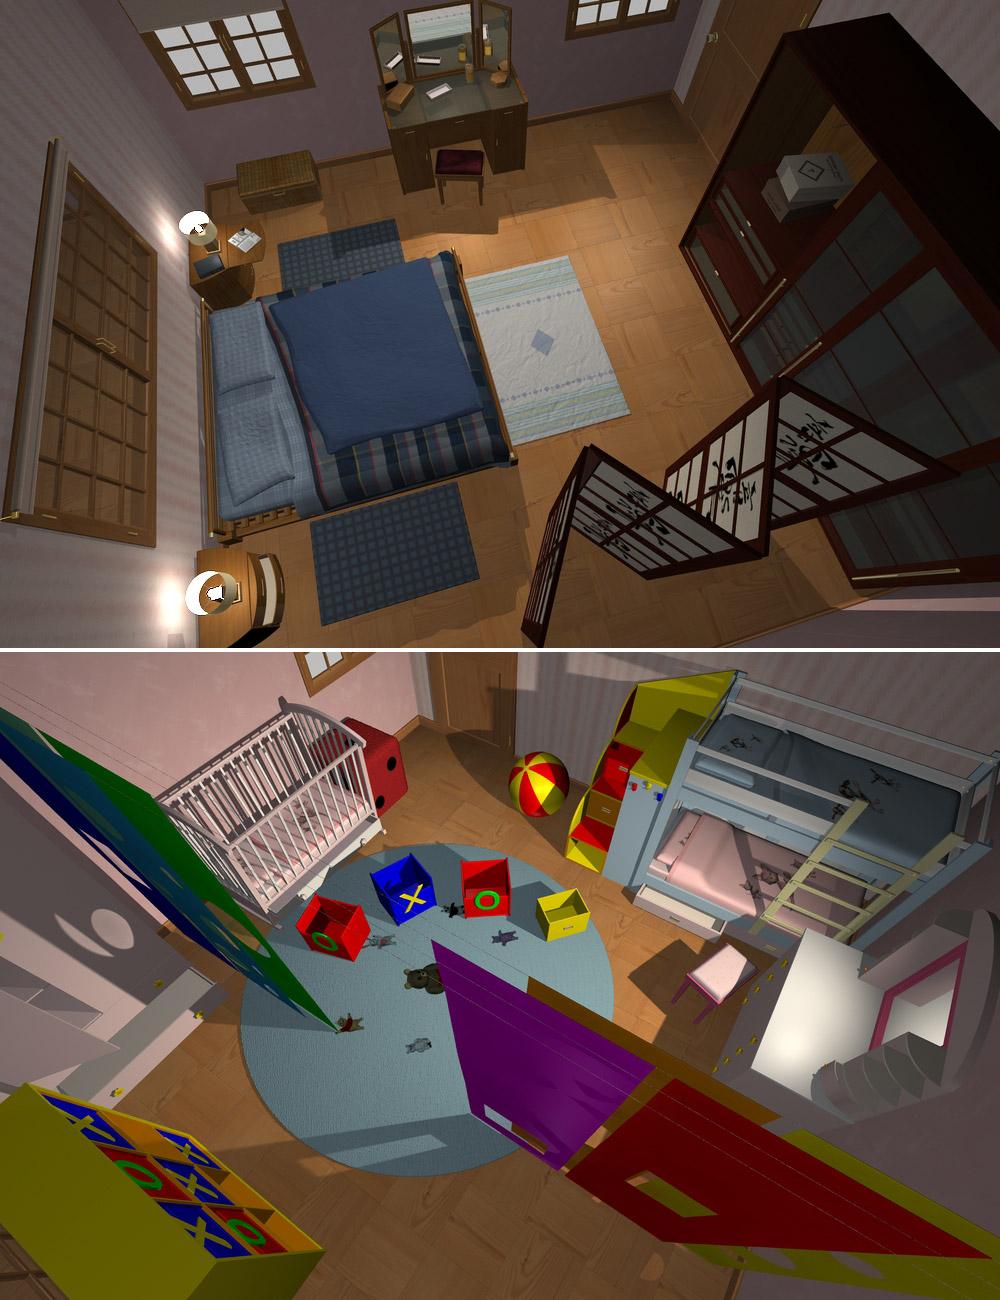 Home One Bedroom by: maclean, 3D Models by Daz 3D